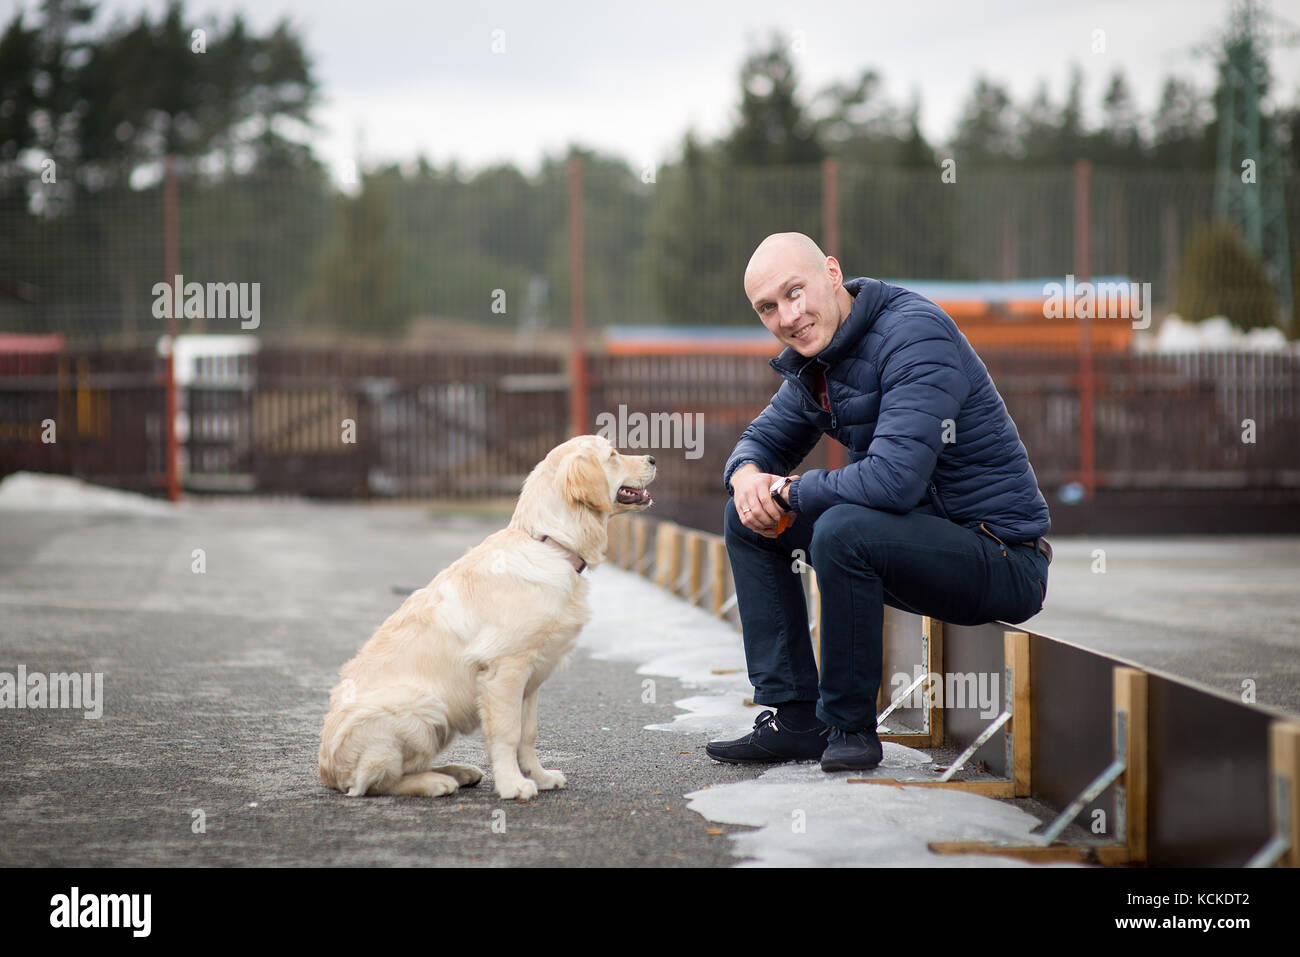 Golden Retriever dog and man - Stock Image